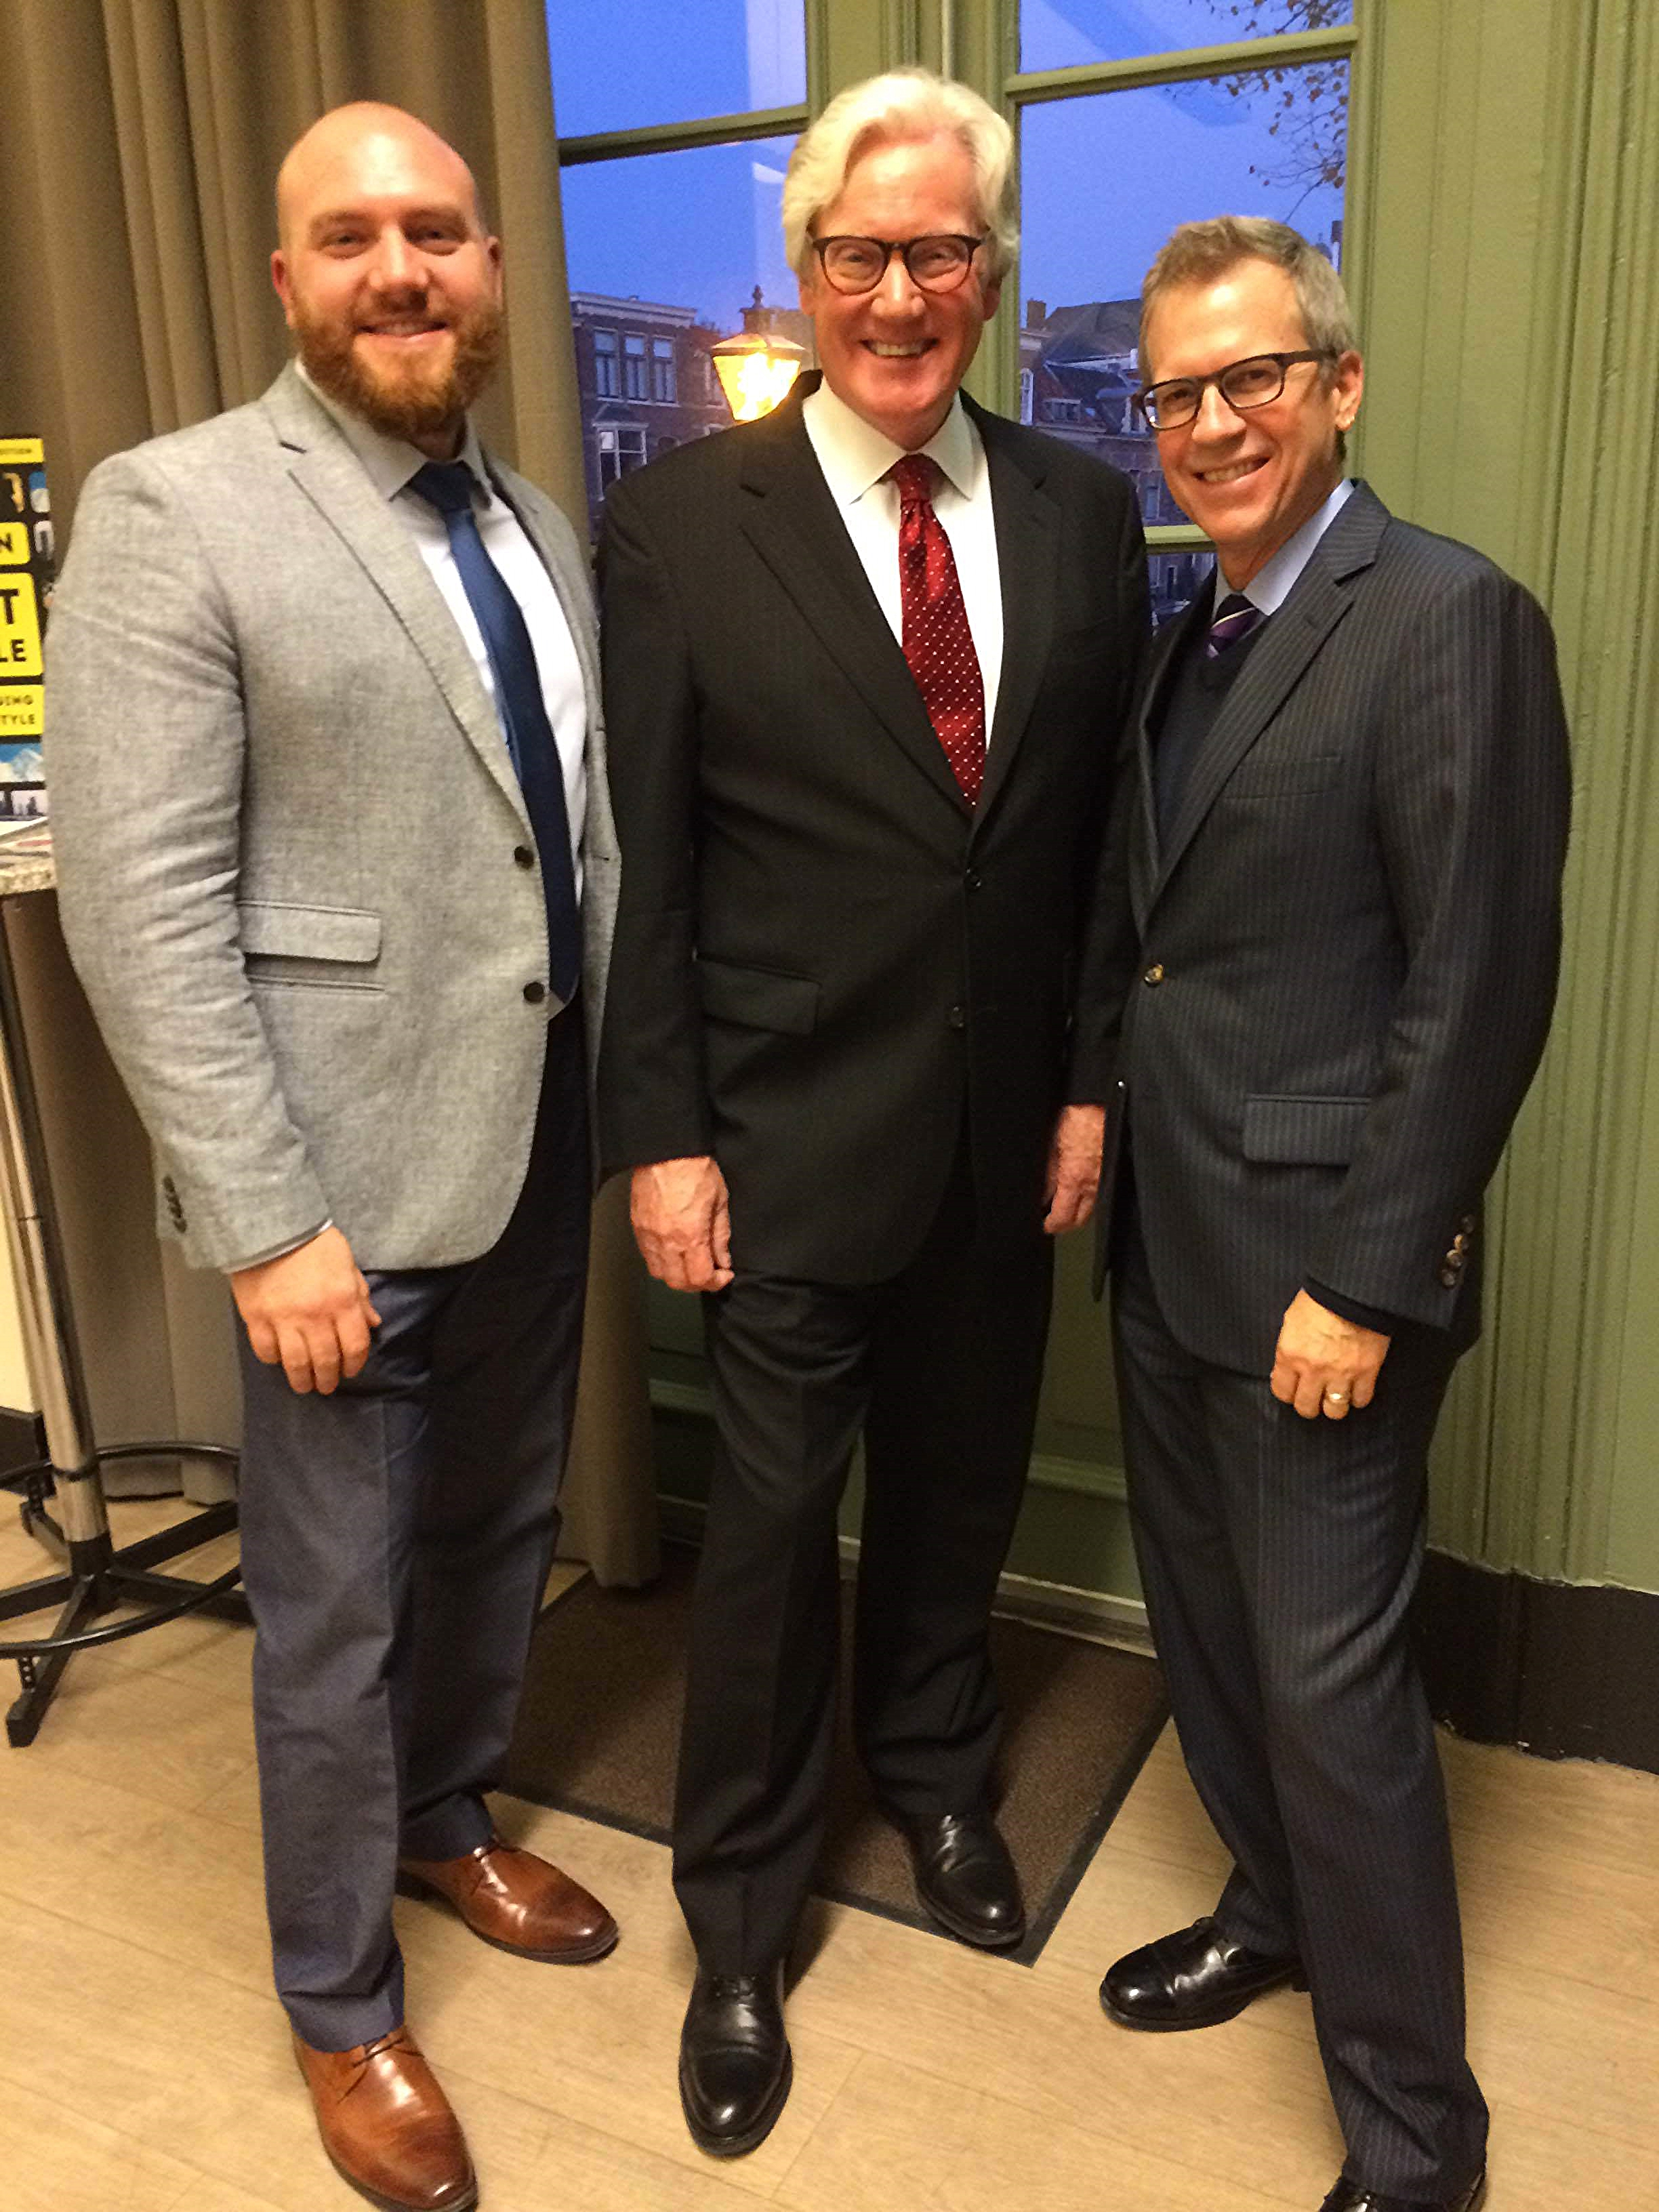 Dr. Leahy | Bob Dotson | Dean Rothenbuhler10.13.2015